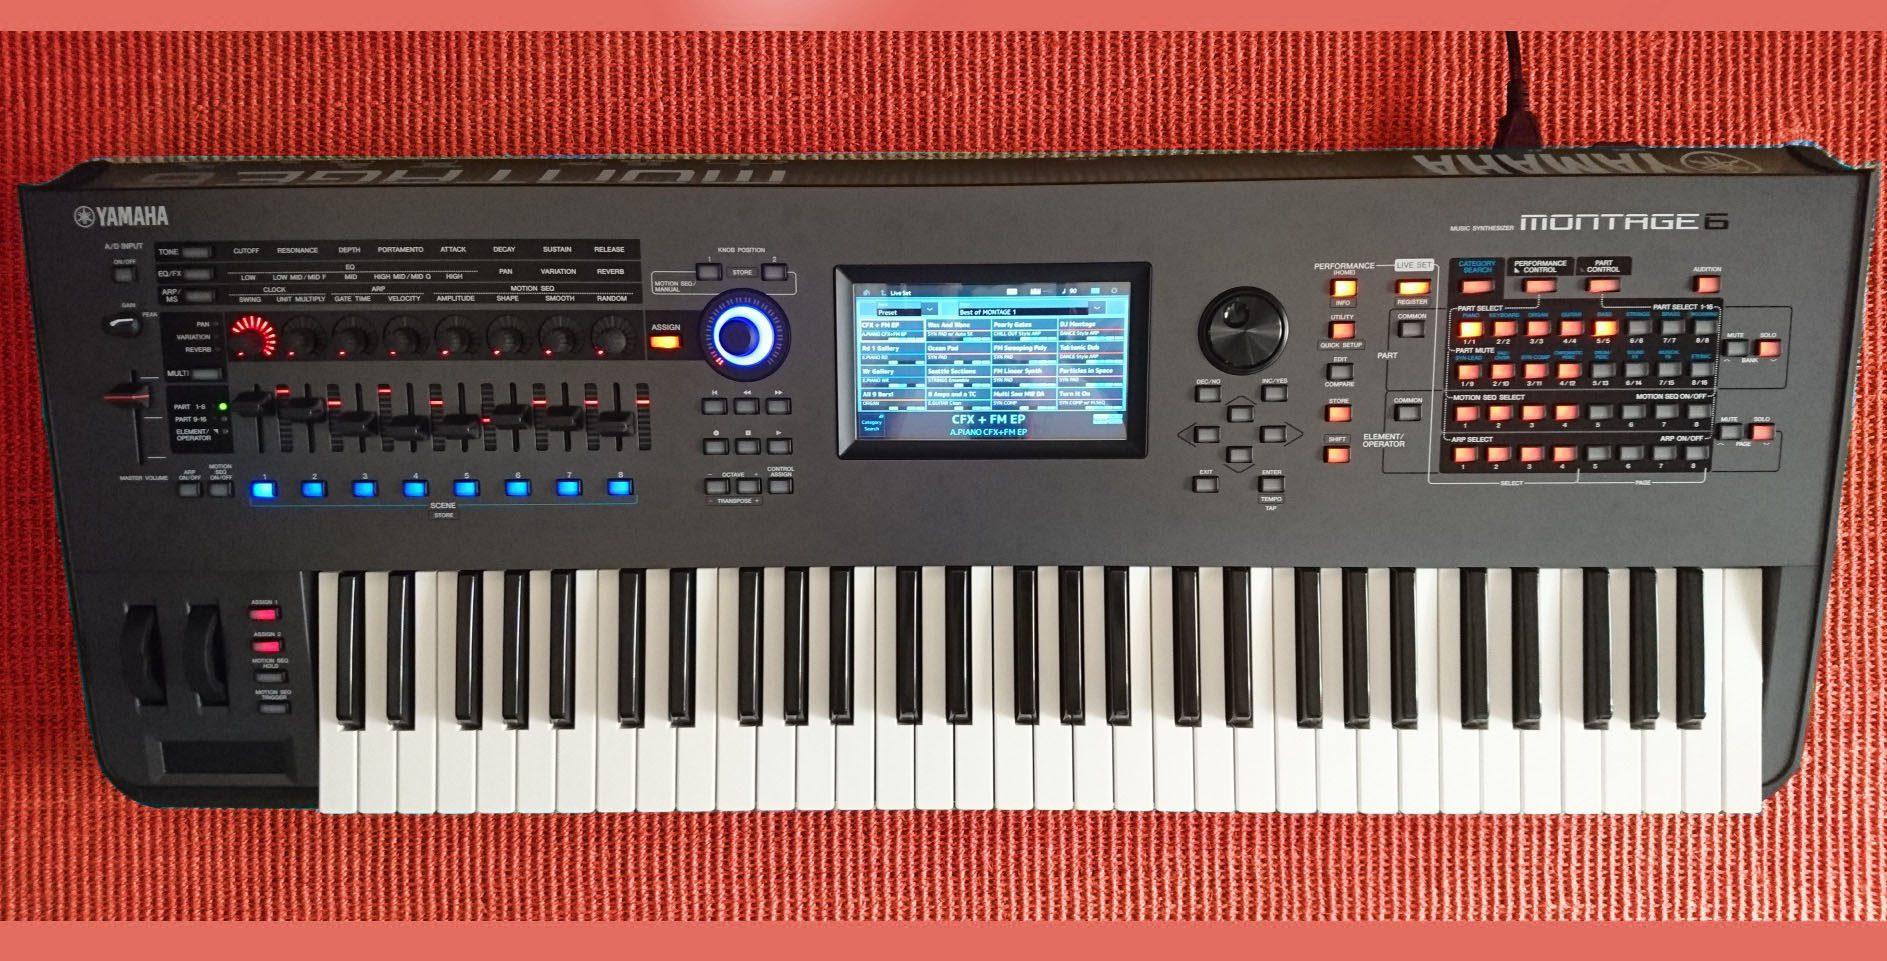 Workshop Yamaha Montage: Sounds mit AWM2 und FM-X - AMAZONA de